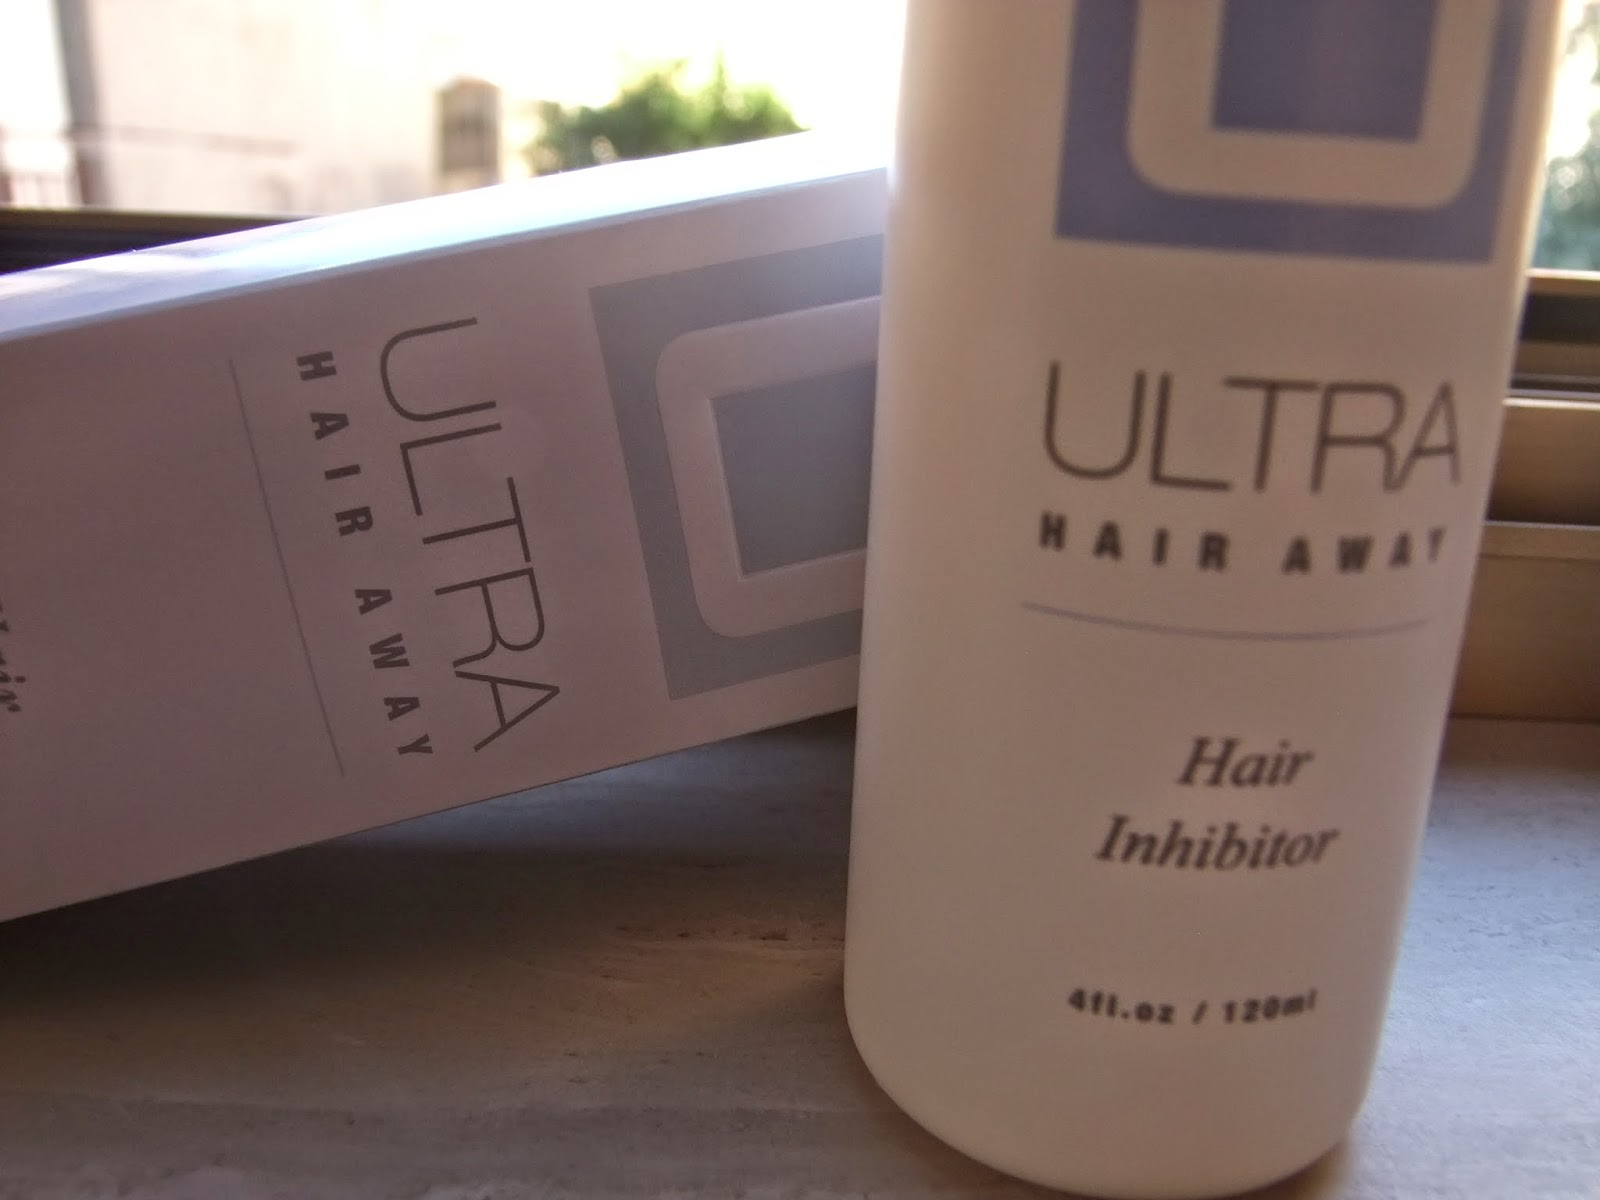 ultra hair away:inibitore della crescita dei peli superflui!!!